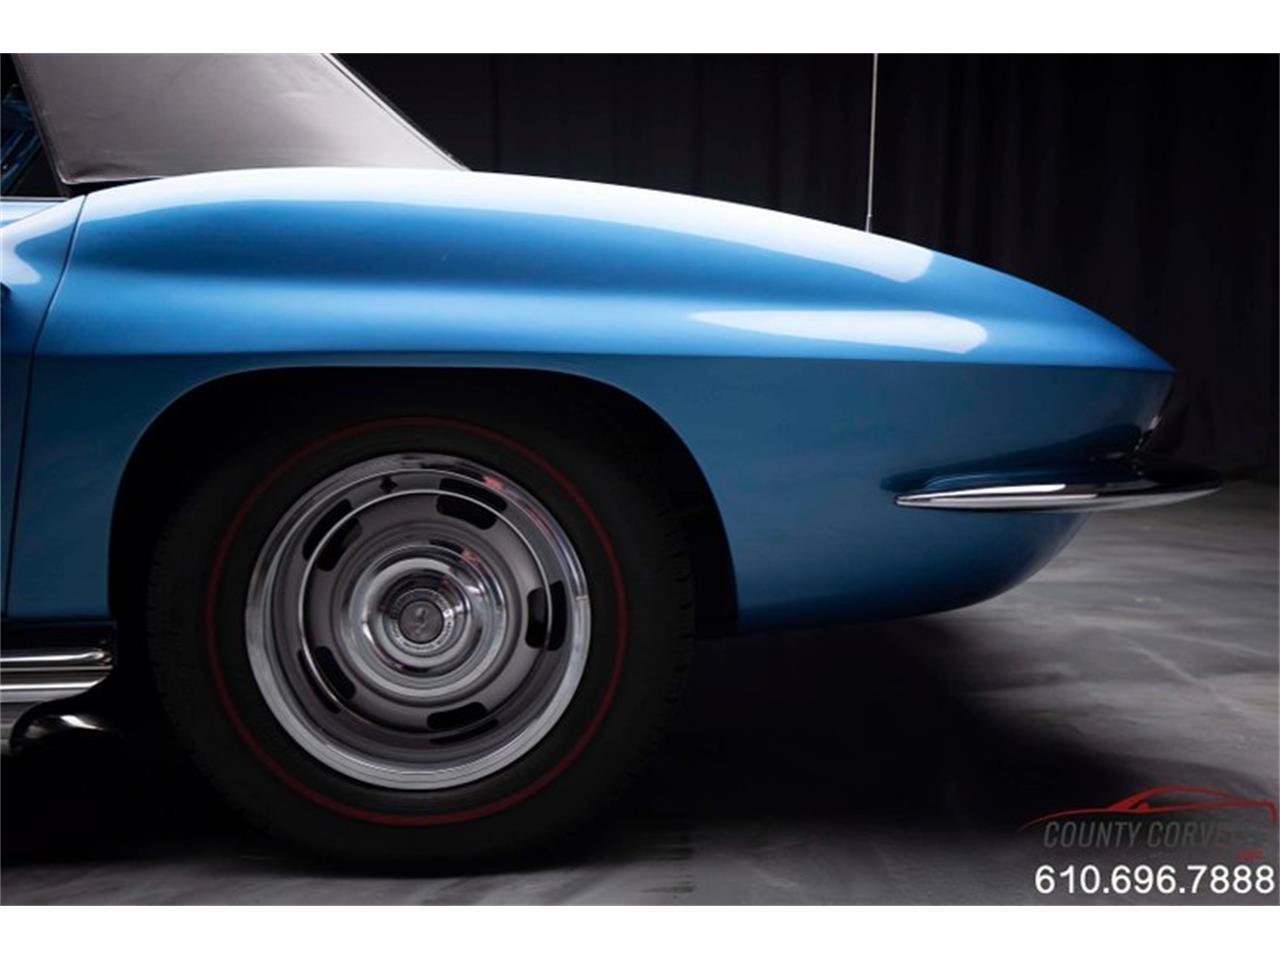 1967 Chevrolet Corvette (CC-1414584) for sale in West Chester, Pennsylvania